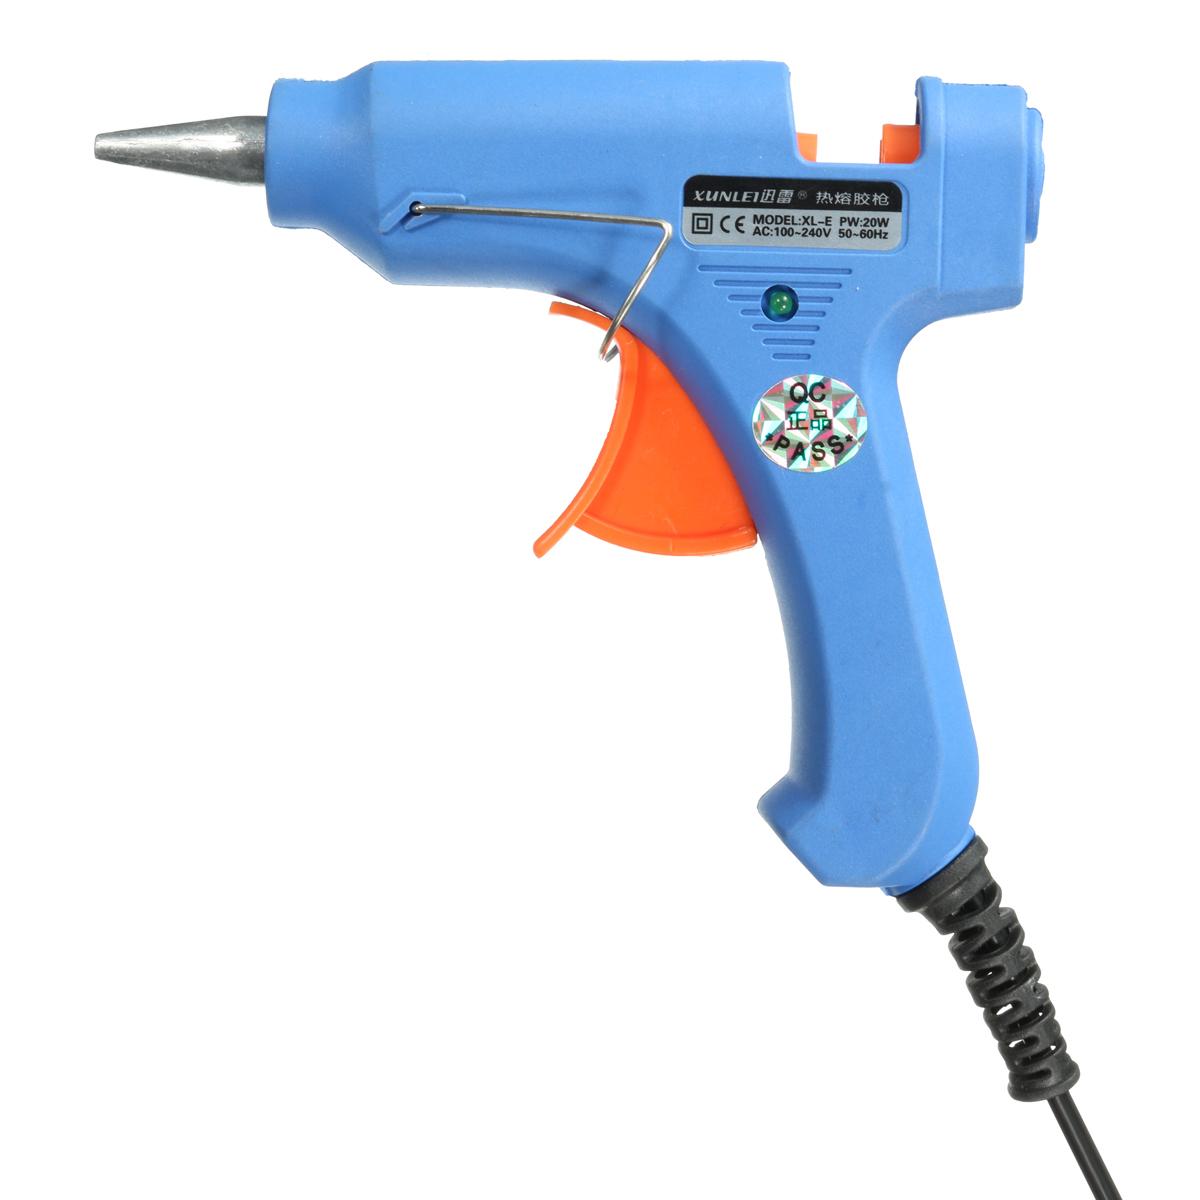 20W Professional Trigger Electric Hot Melt Glue Gun for Hobby Craft Art Mini DIY